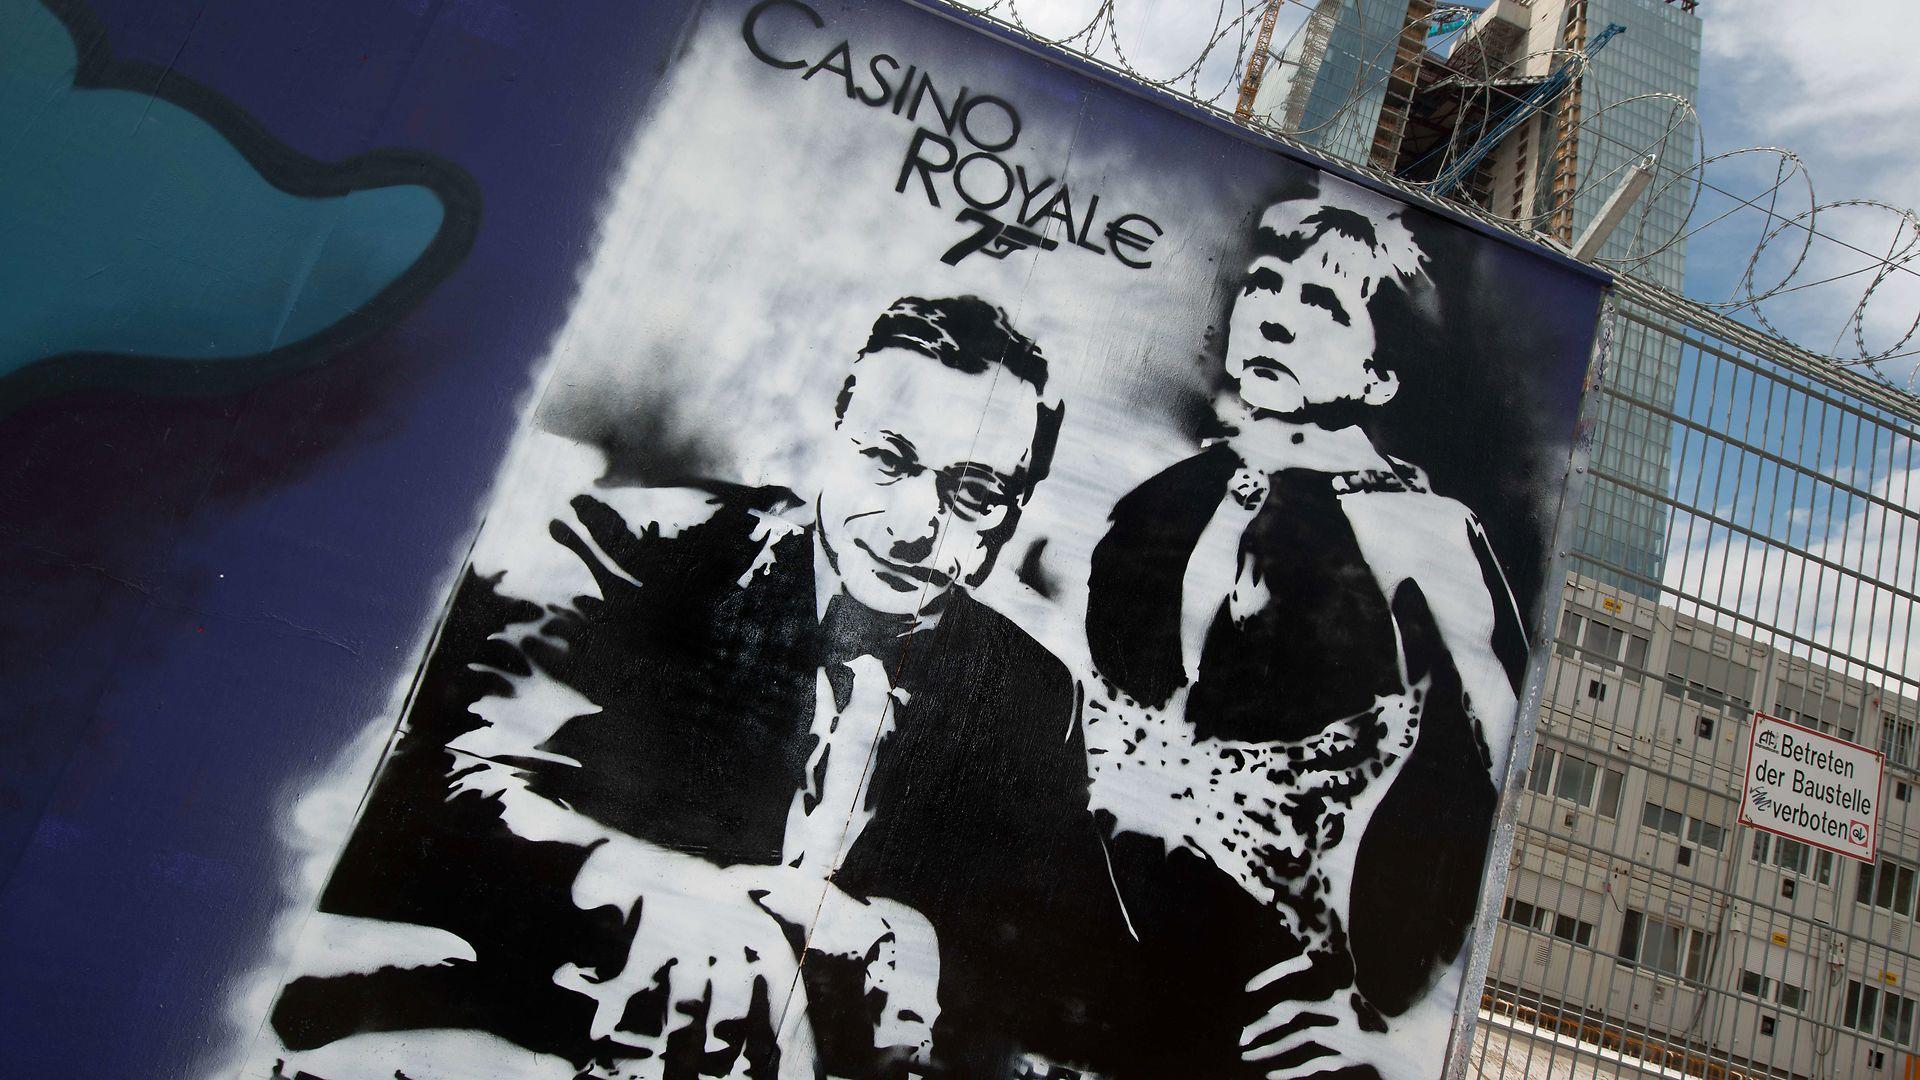 David Rischel i RÆSON38: De liberale institutioners krise